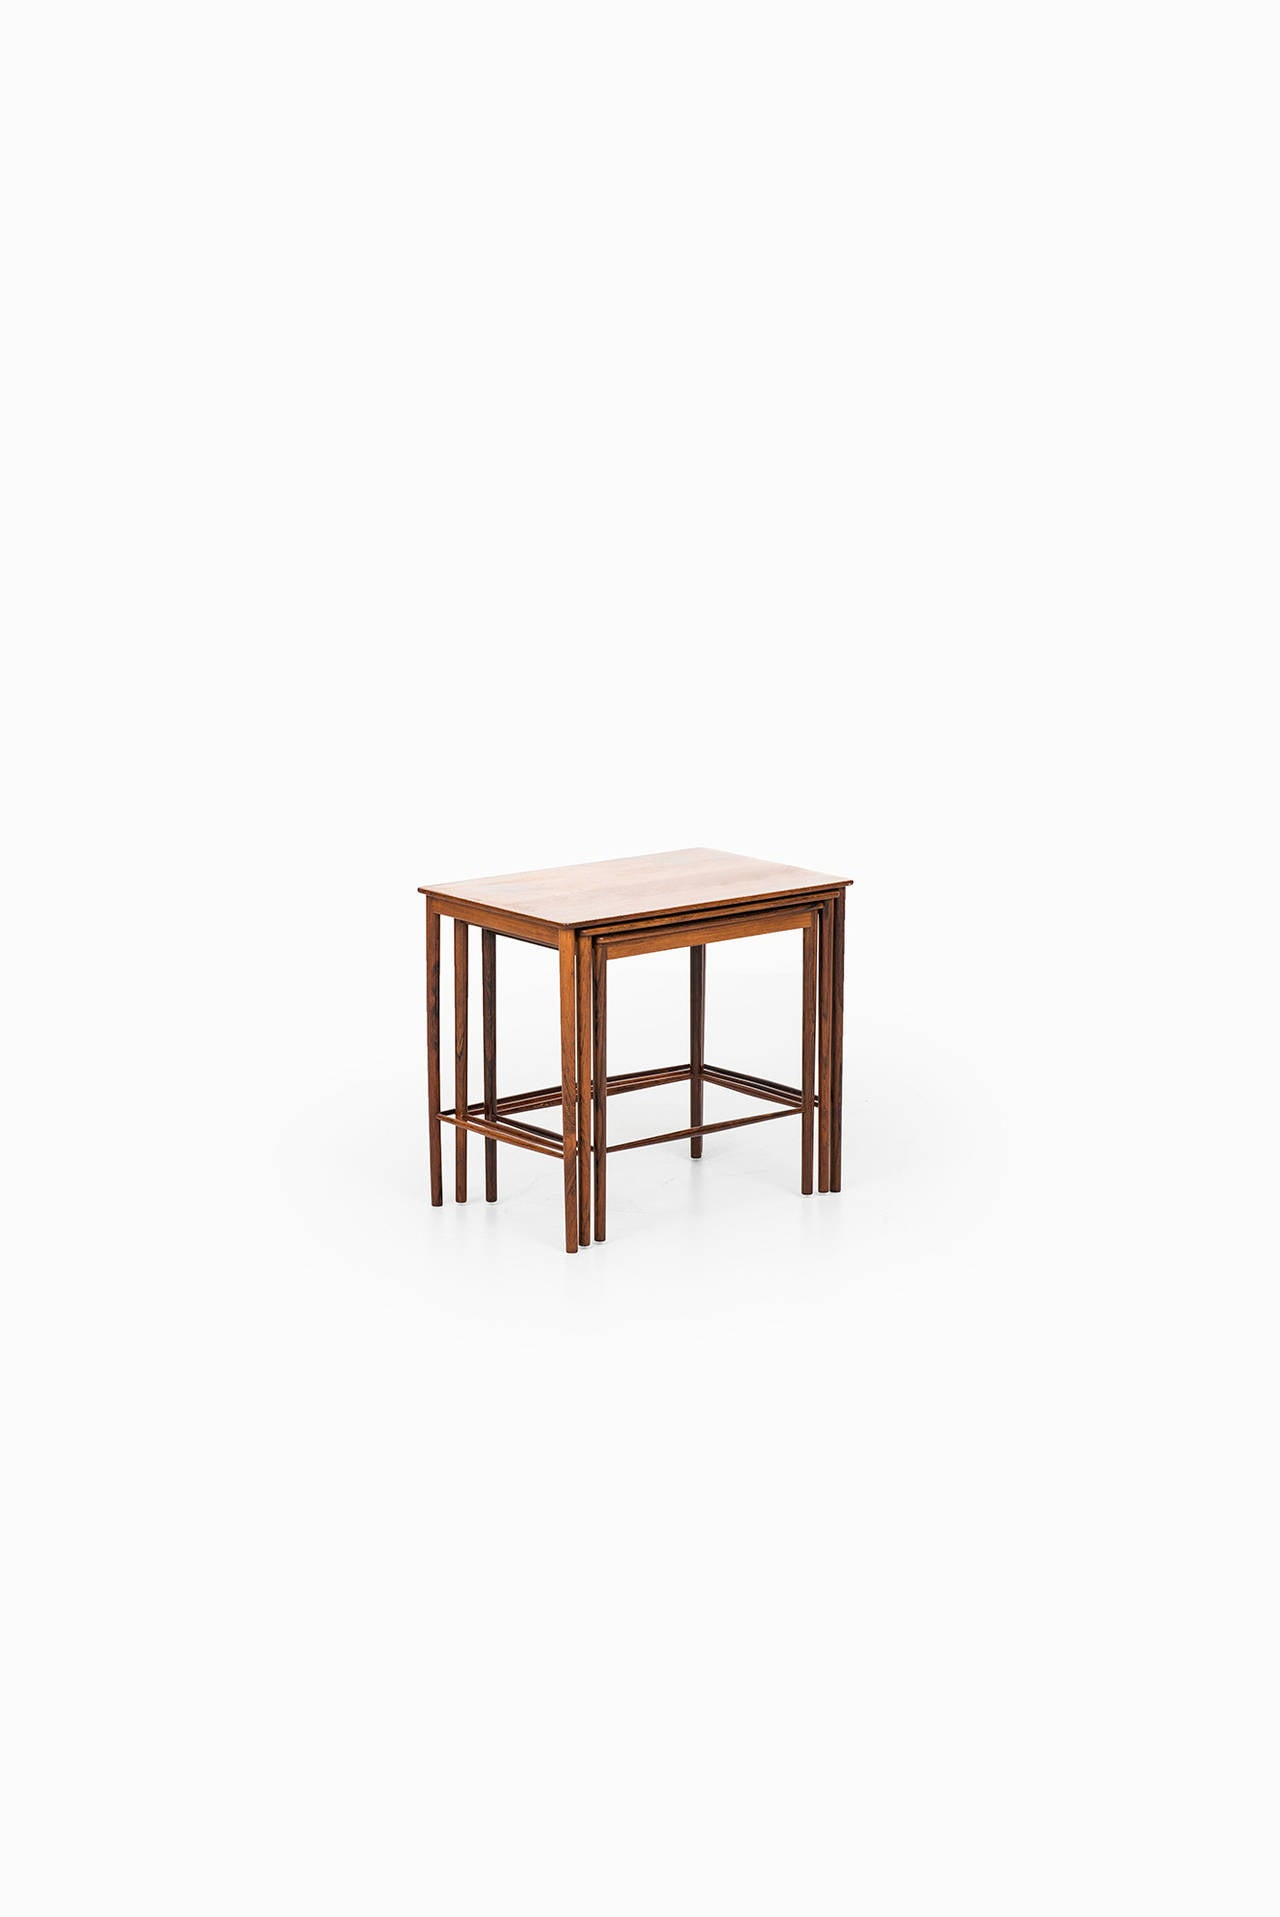 Grete jalk nesting tables in rosewood by p jeppesen in for P jeppesen furniture